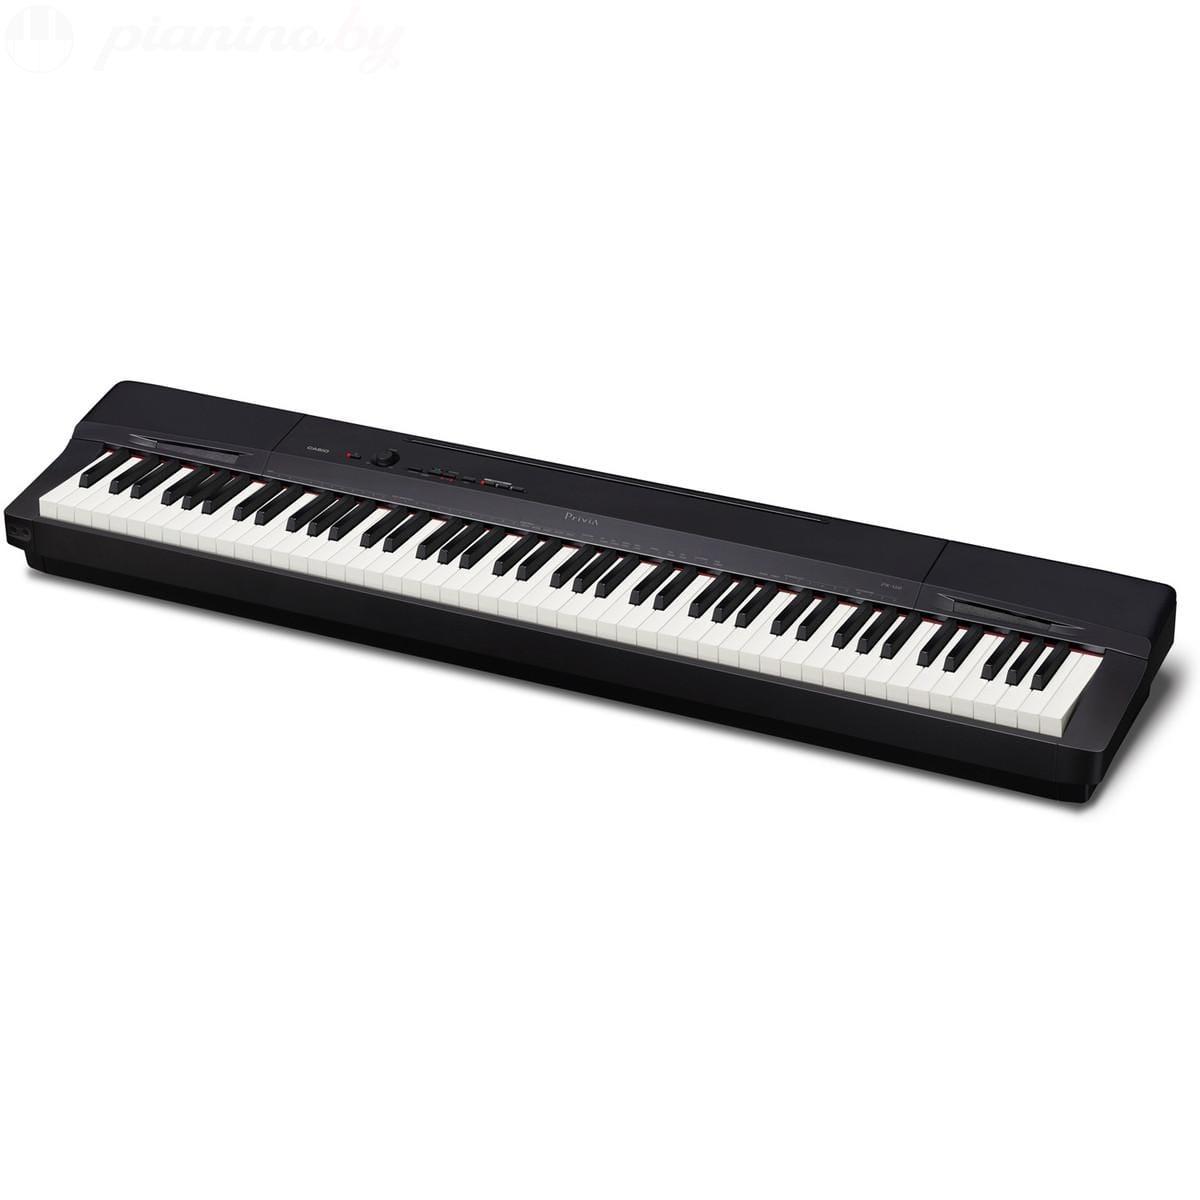 Цифровое пианино Casio PX-160BK Black Фото 1